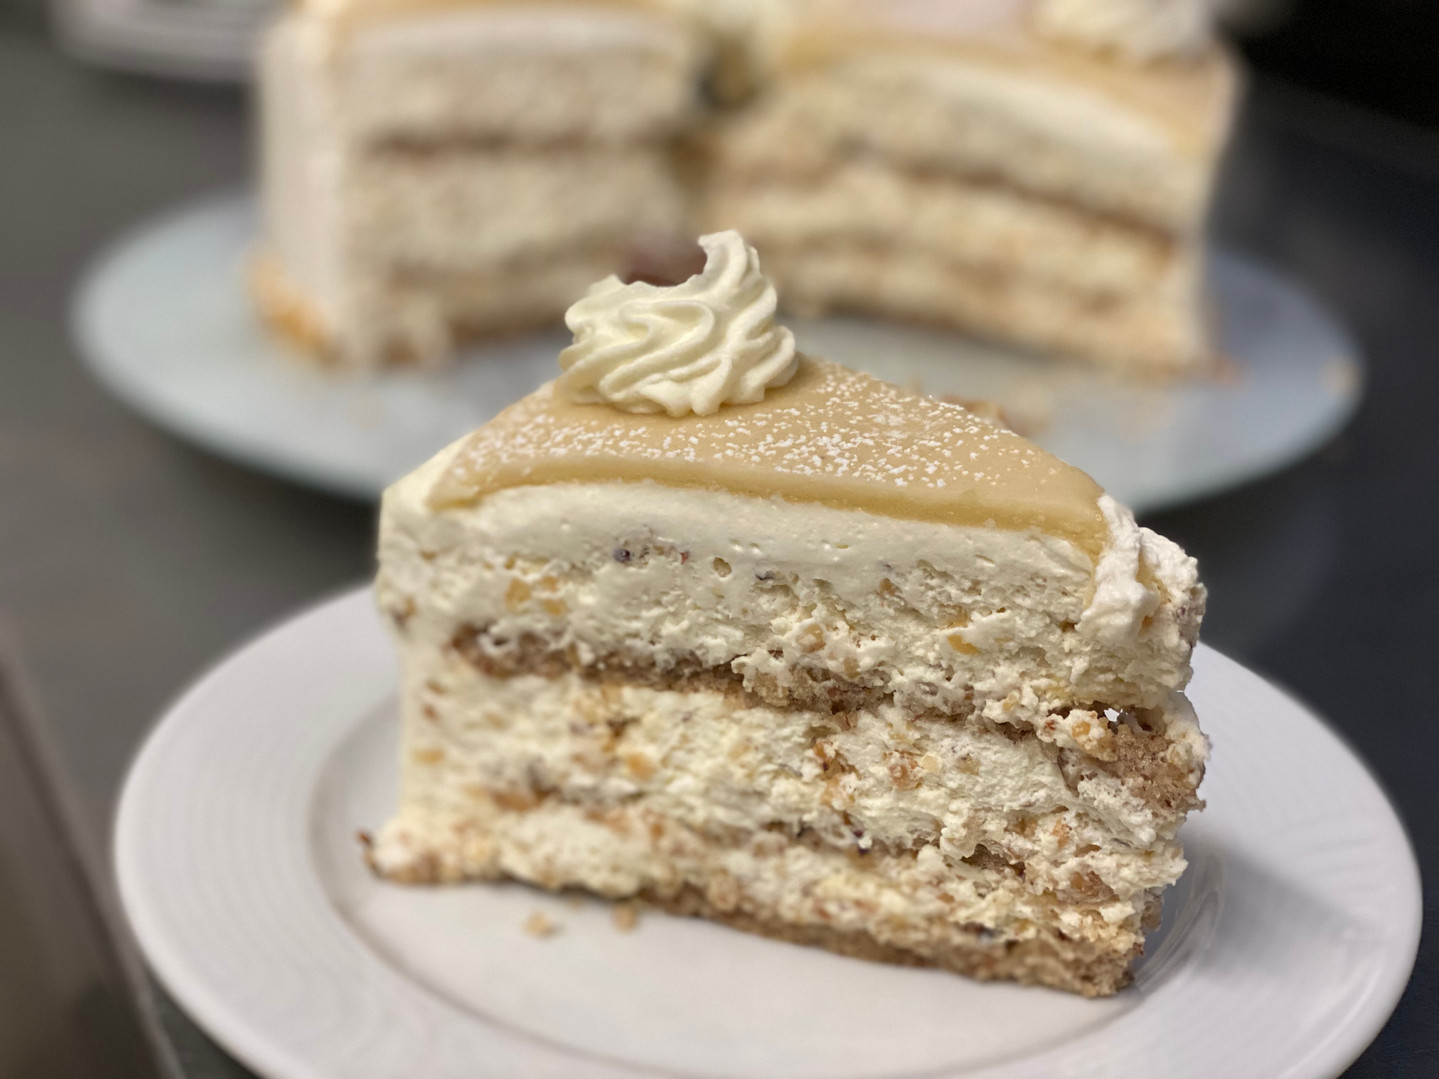 Torte Lunch & Sweet im Hotel Wegner - the culinary art hotel